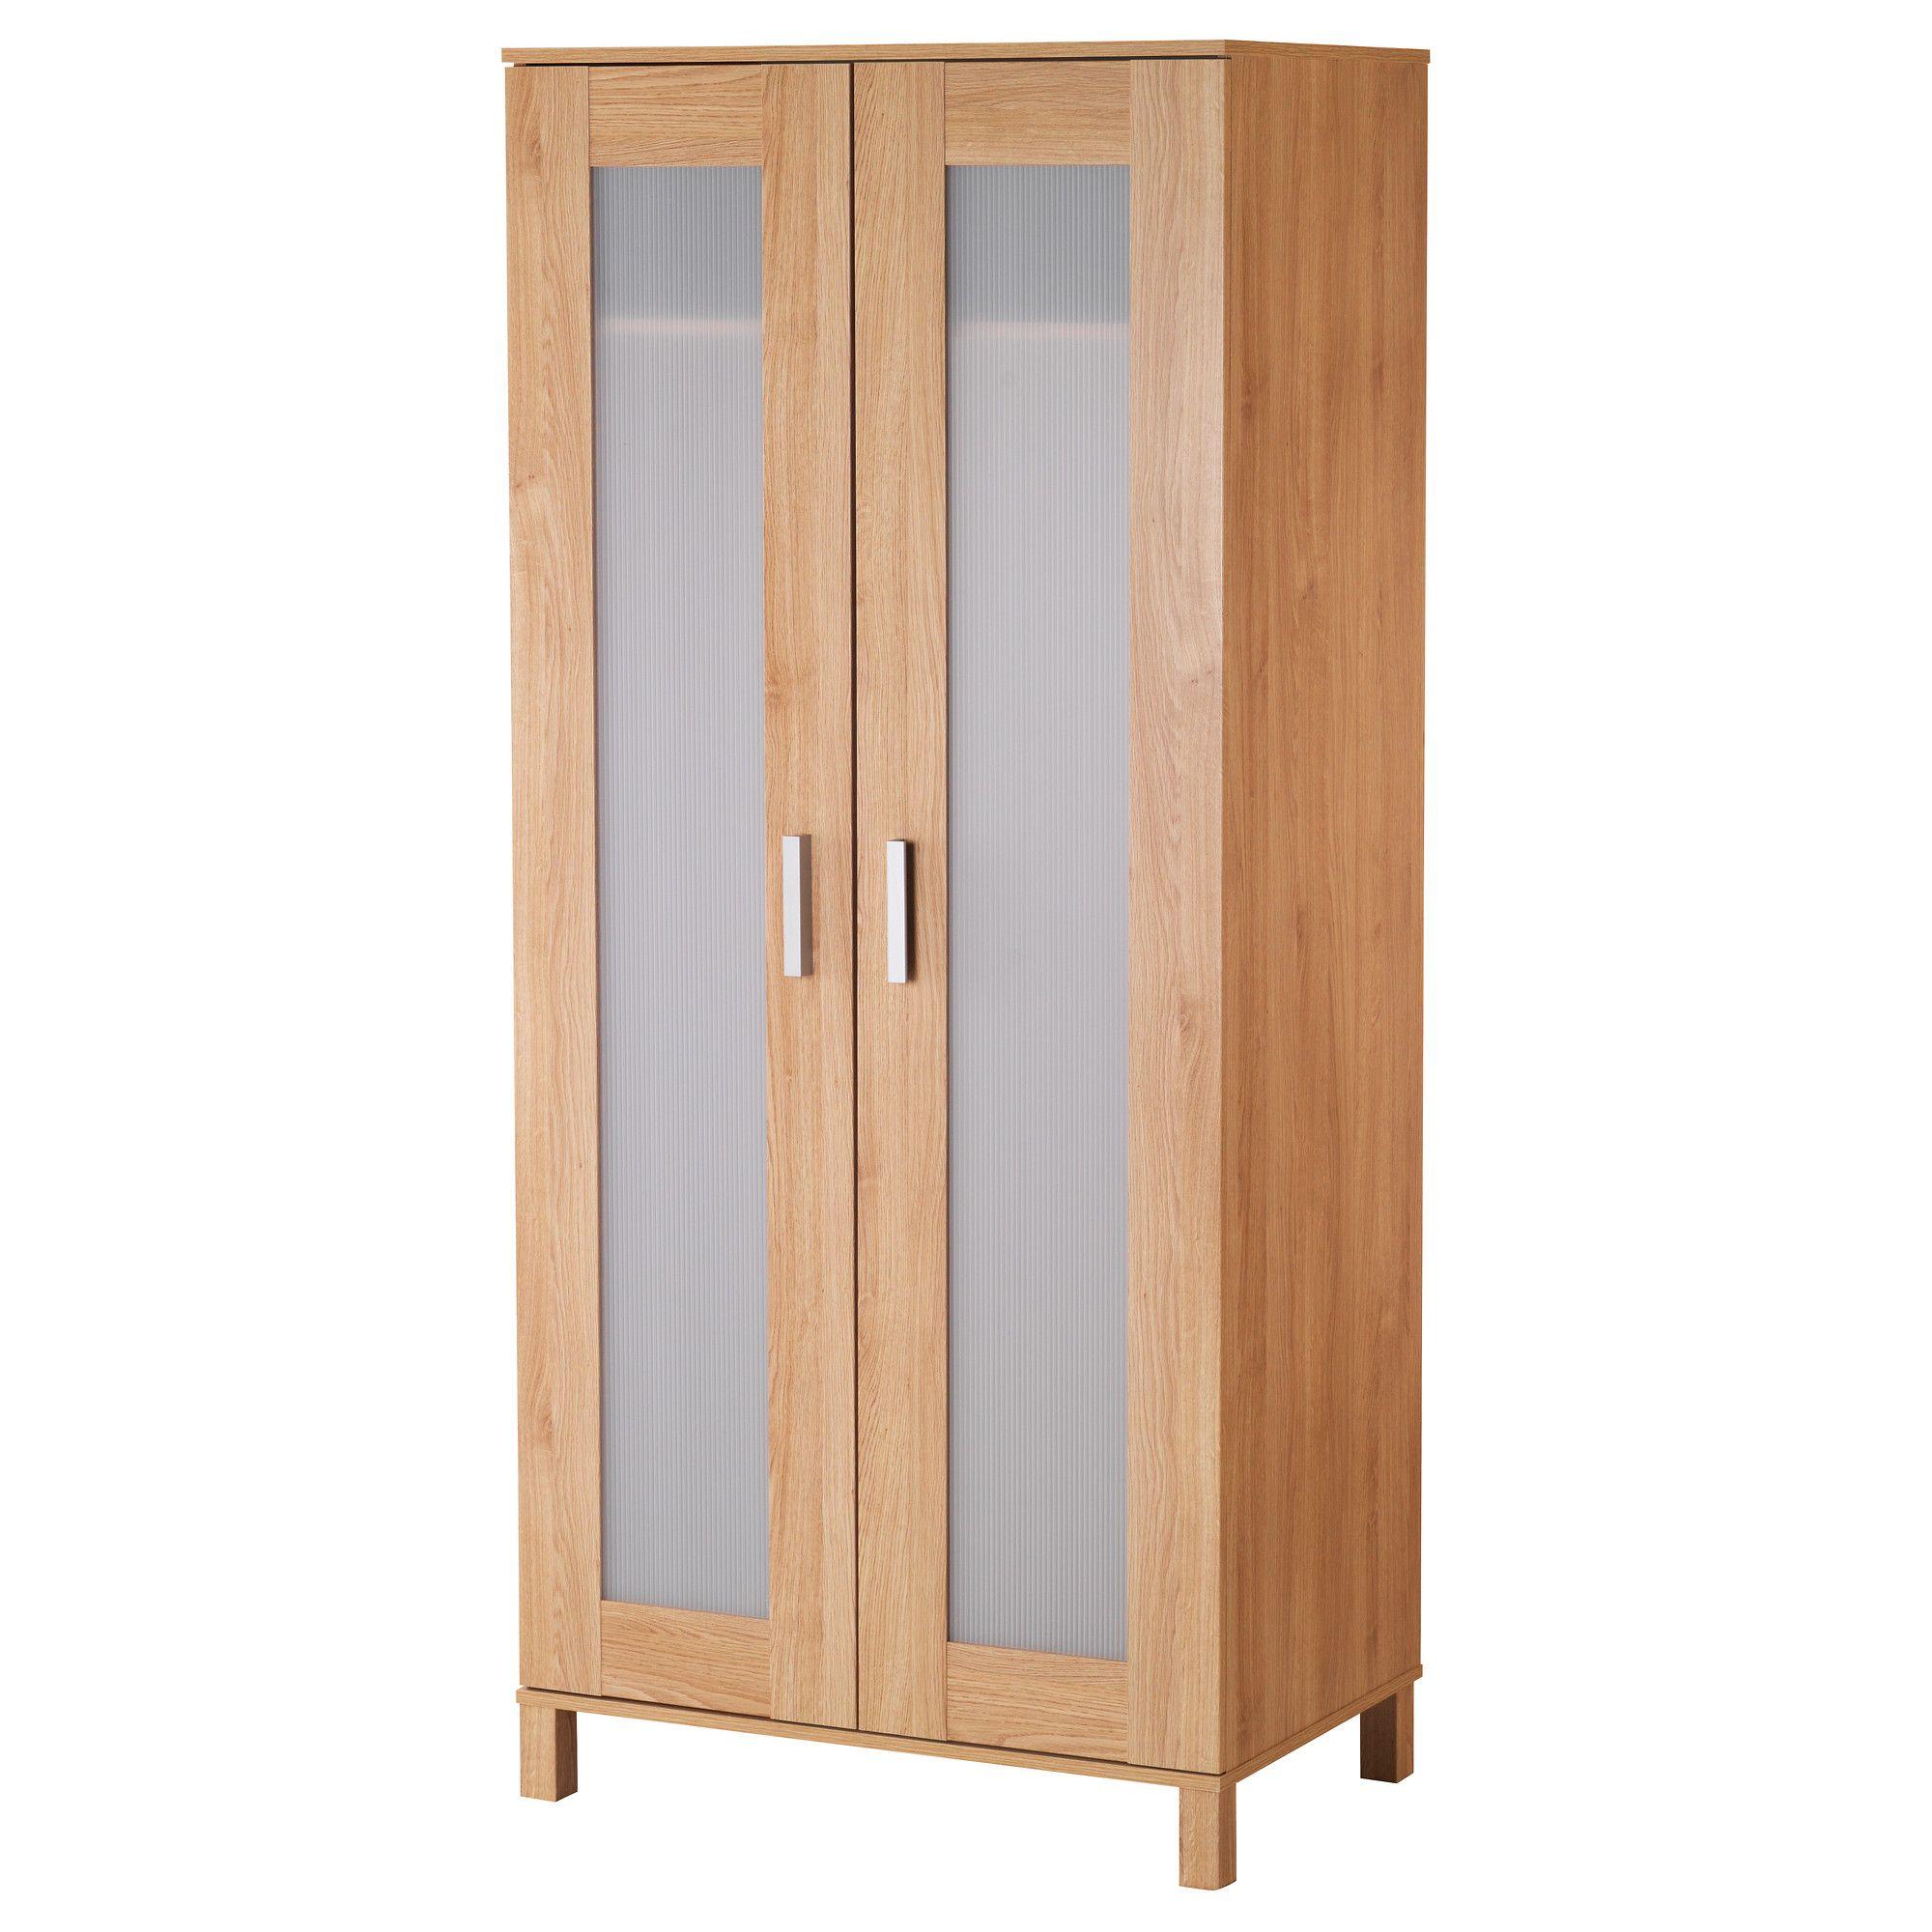 How To Make A Free Standing Wardrobe With Sliding Doors: AUSTMARKA Wardrobe - Birch Effect - IKEA